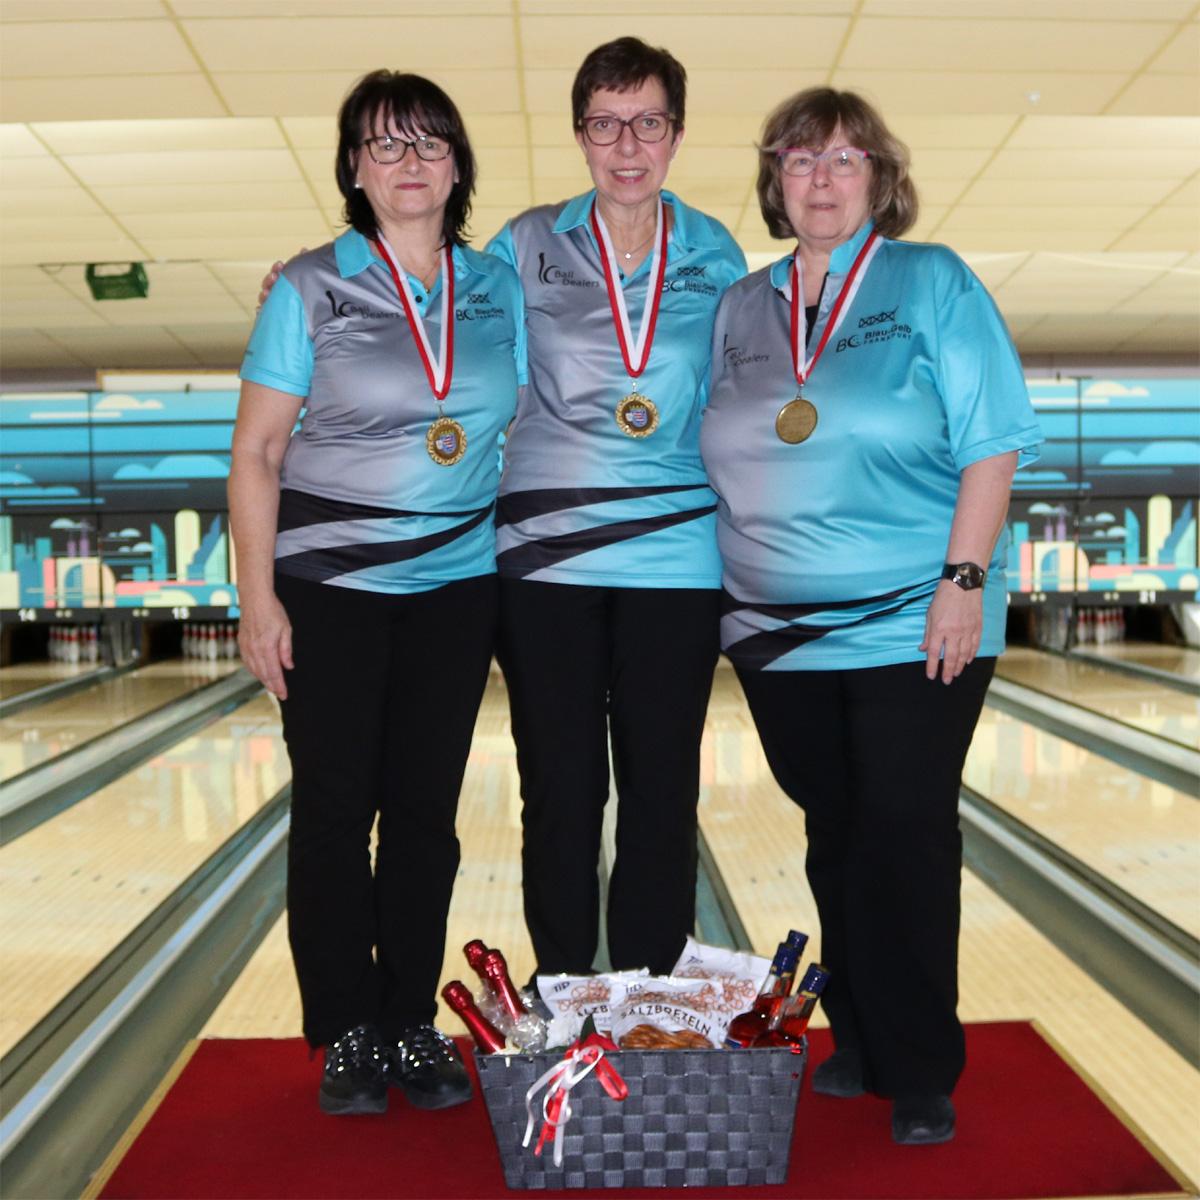 Platz 1 - Hessenmeisterinnen: Edith, Petra und Luci